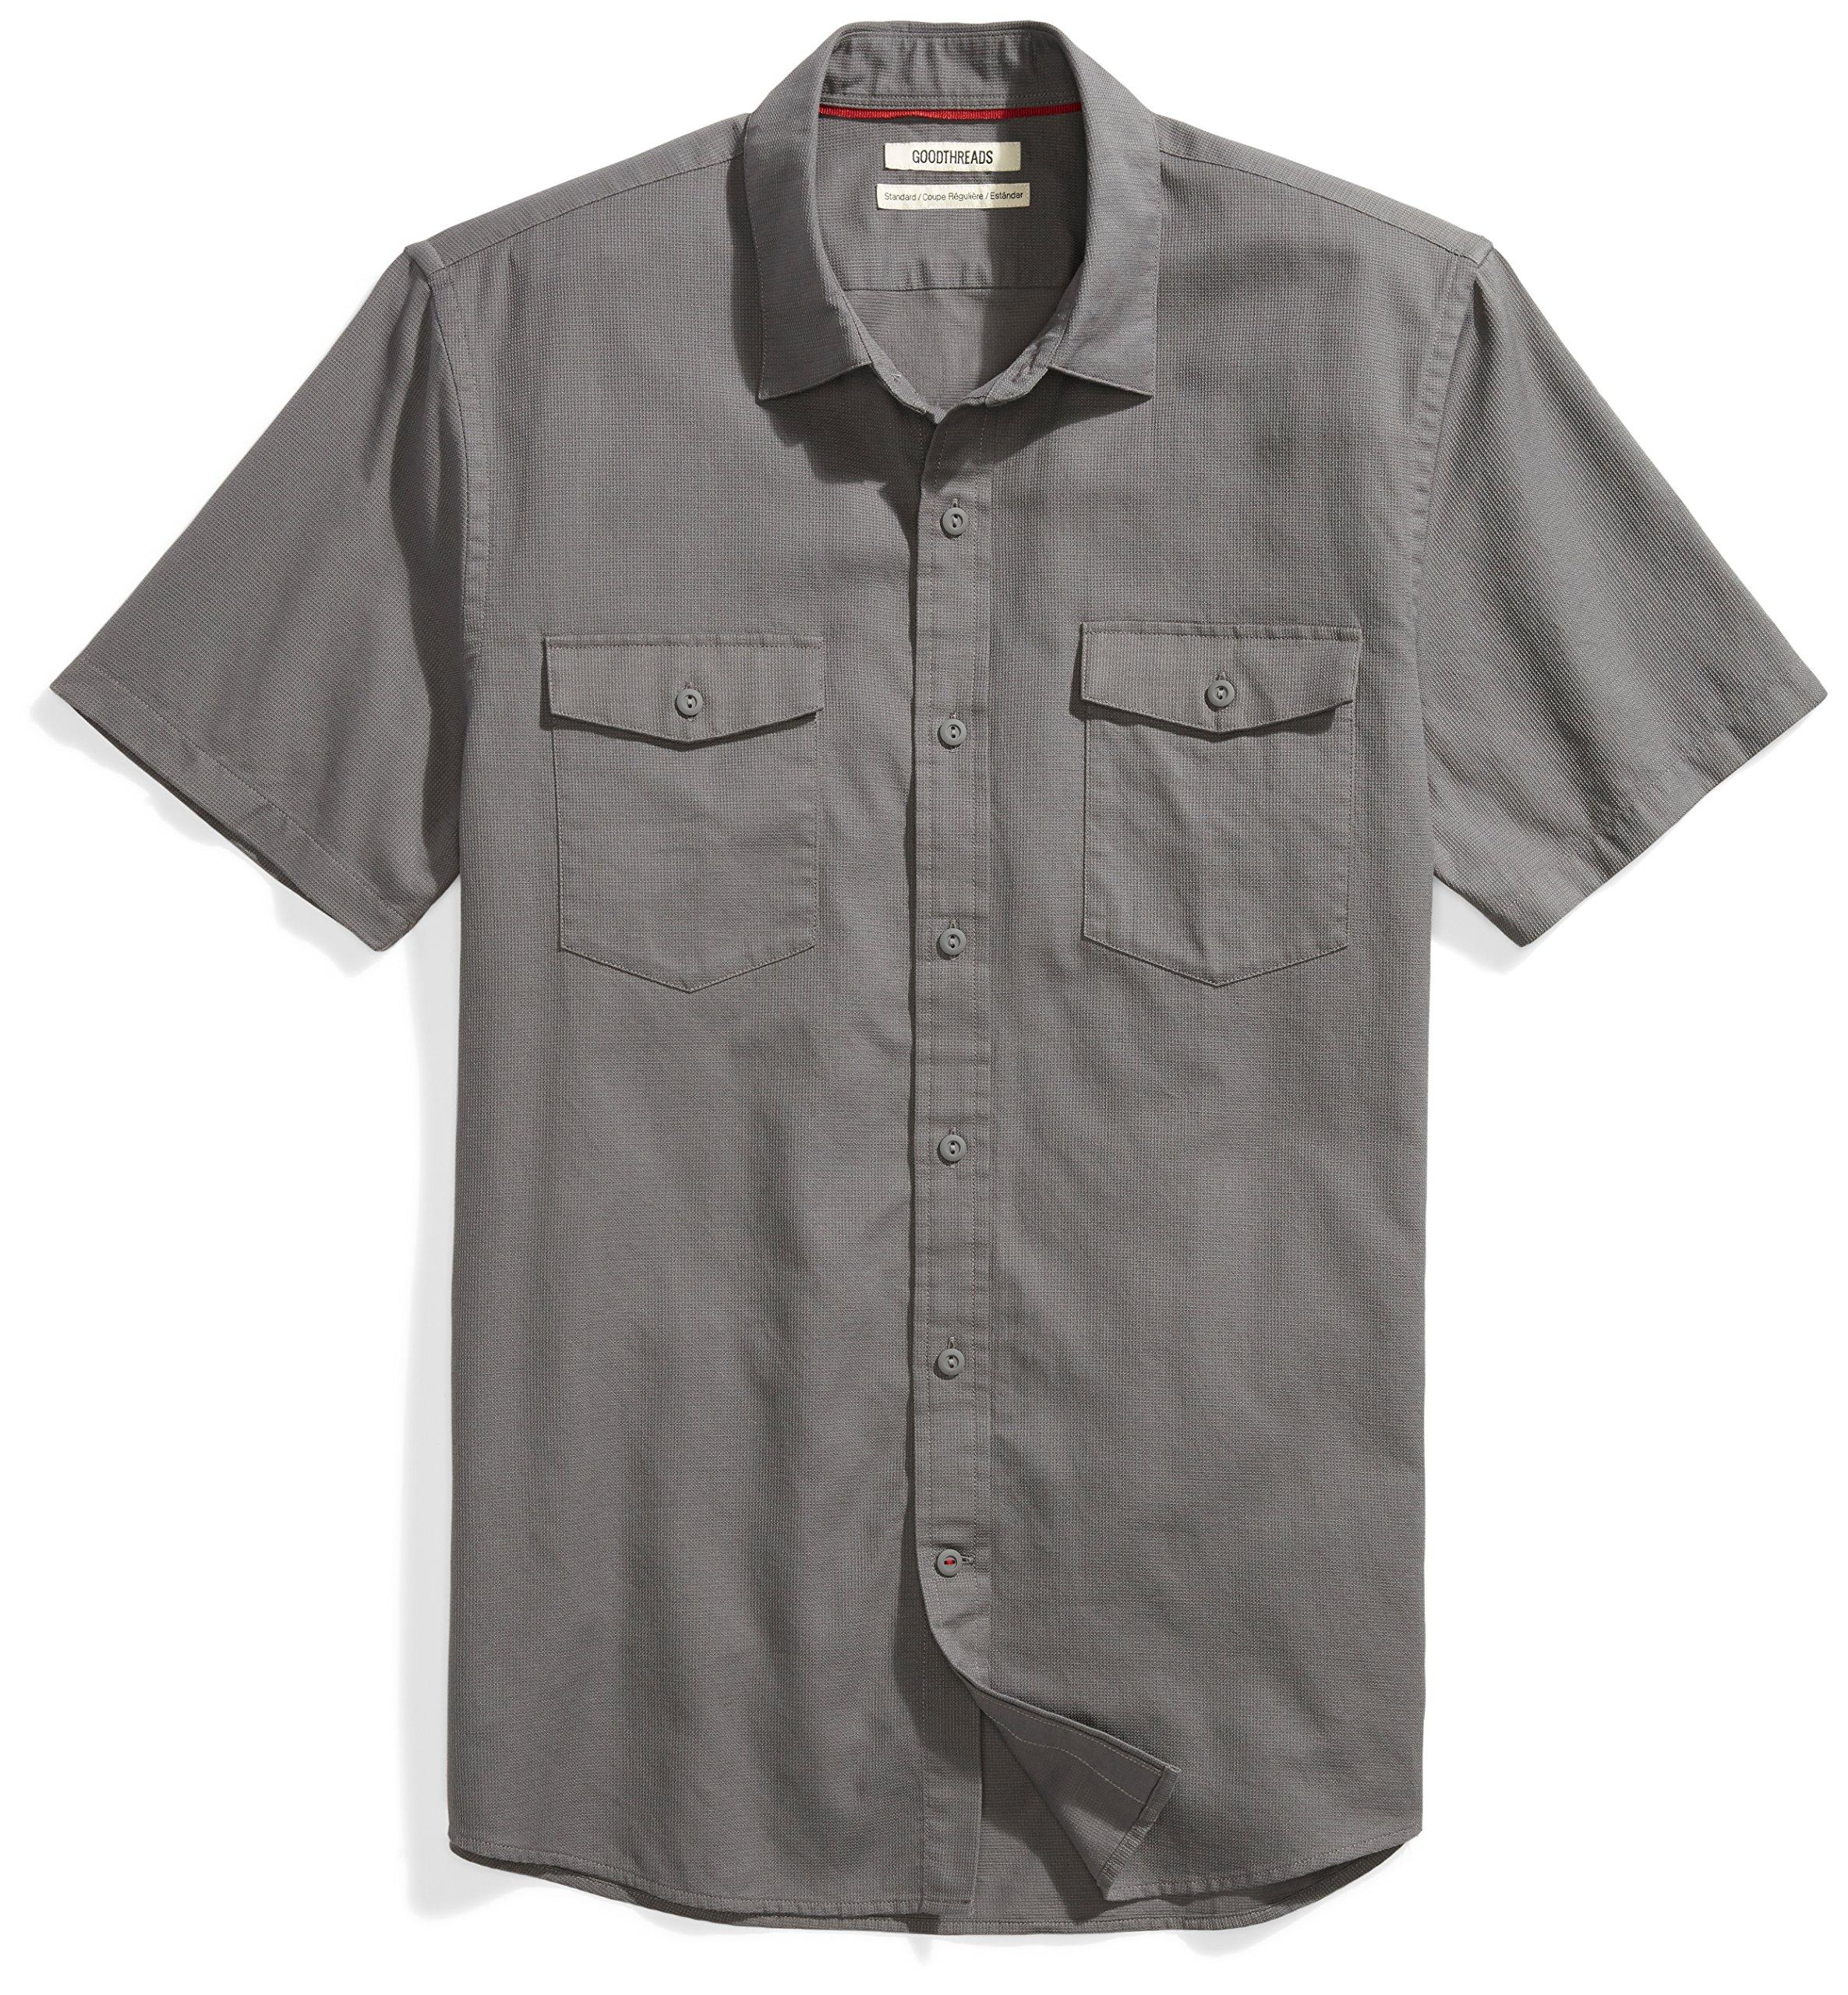 Goodthreads Men's Standard-Fit Short-Sleeve Ripstop Dobby Shirt, Grey, X-Large